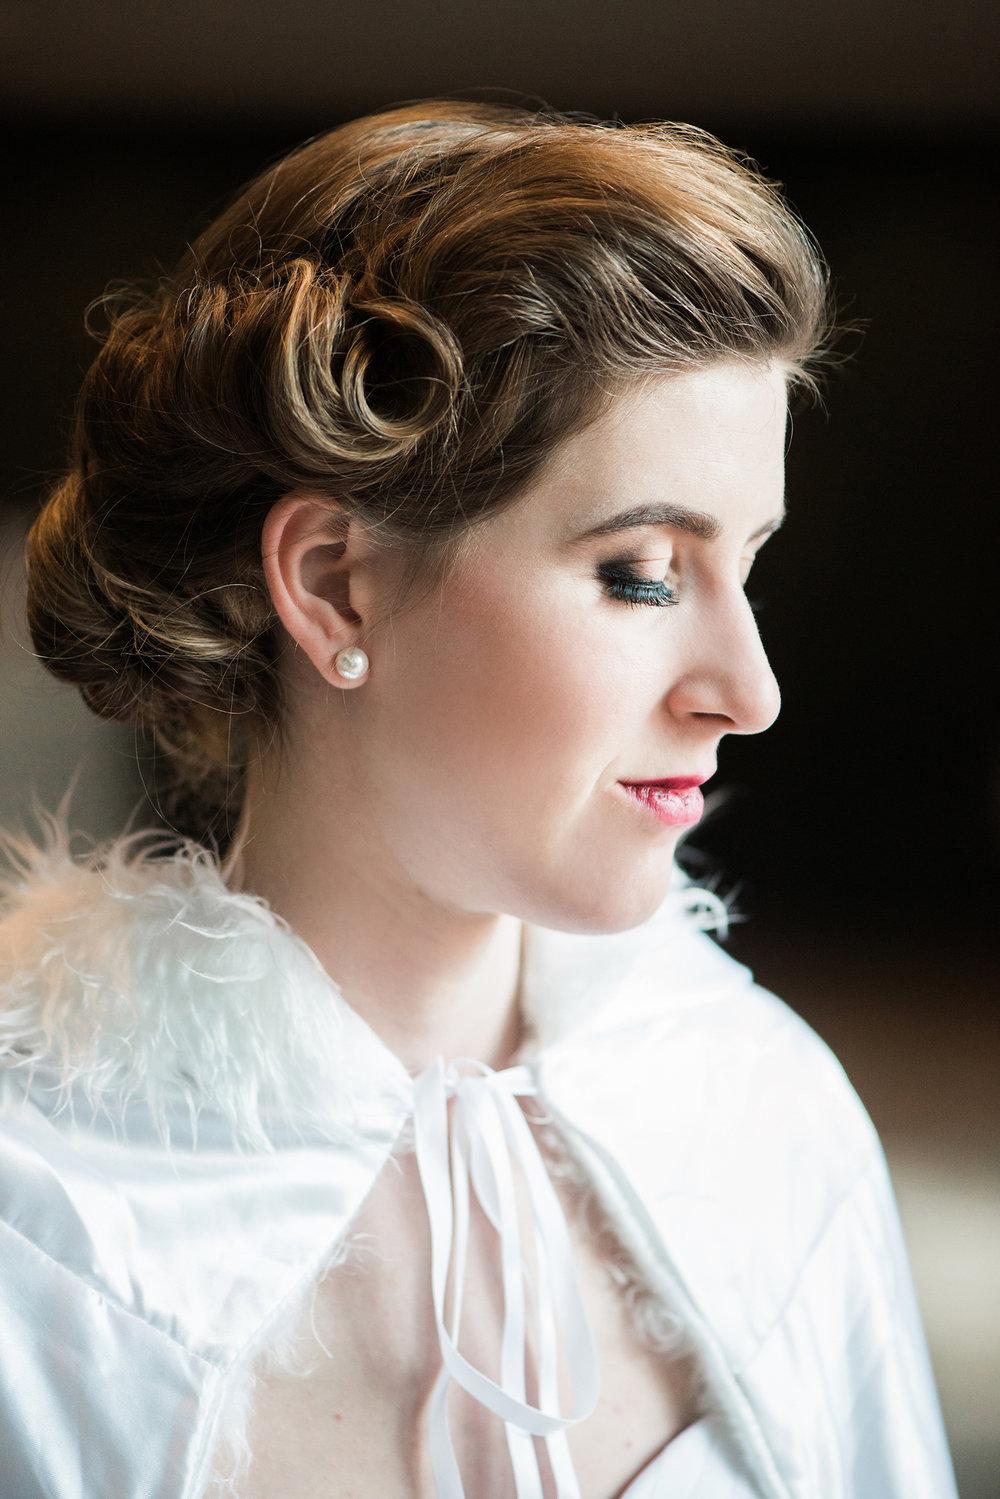 romantic-vintage-wedding-urban-venue-hairstyle.jpg